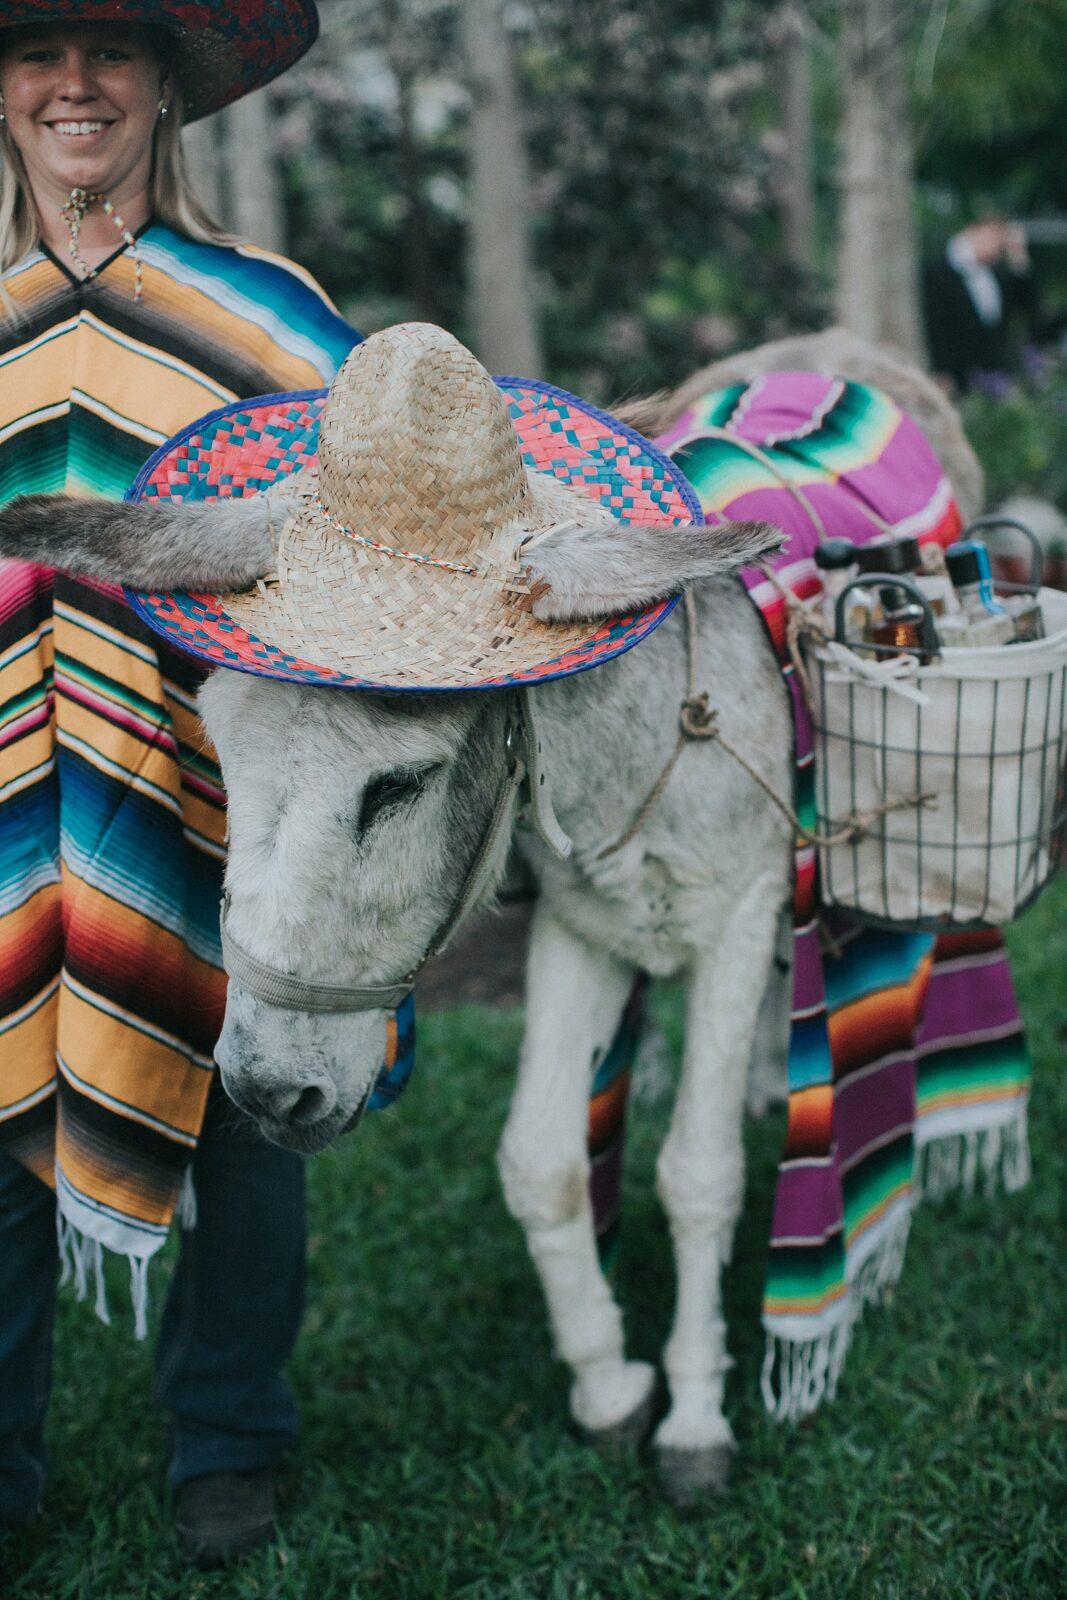 tequila donkey